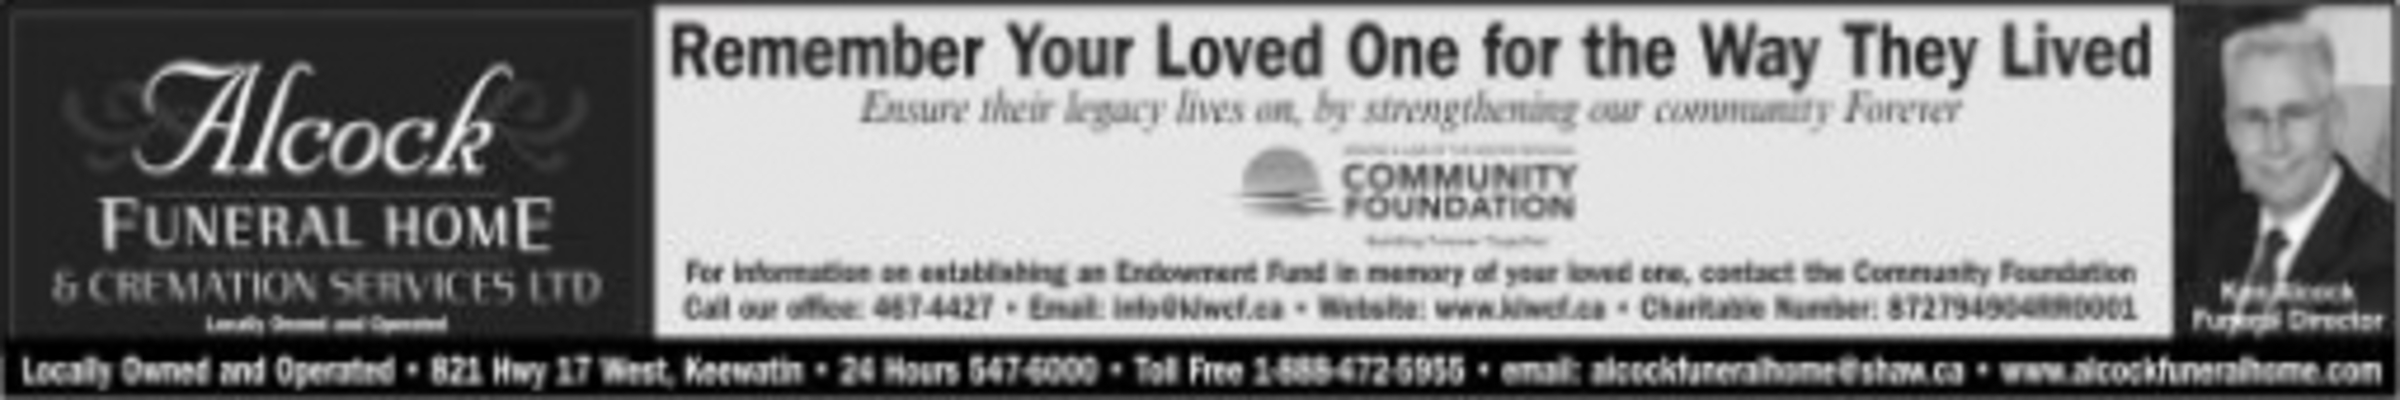 Obituaries | Kenora Daily Miner and News